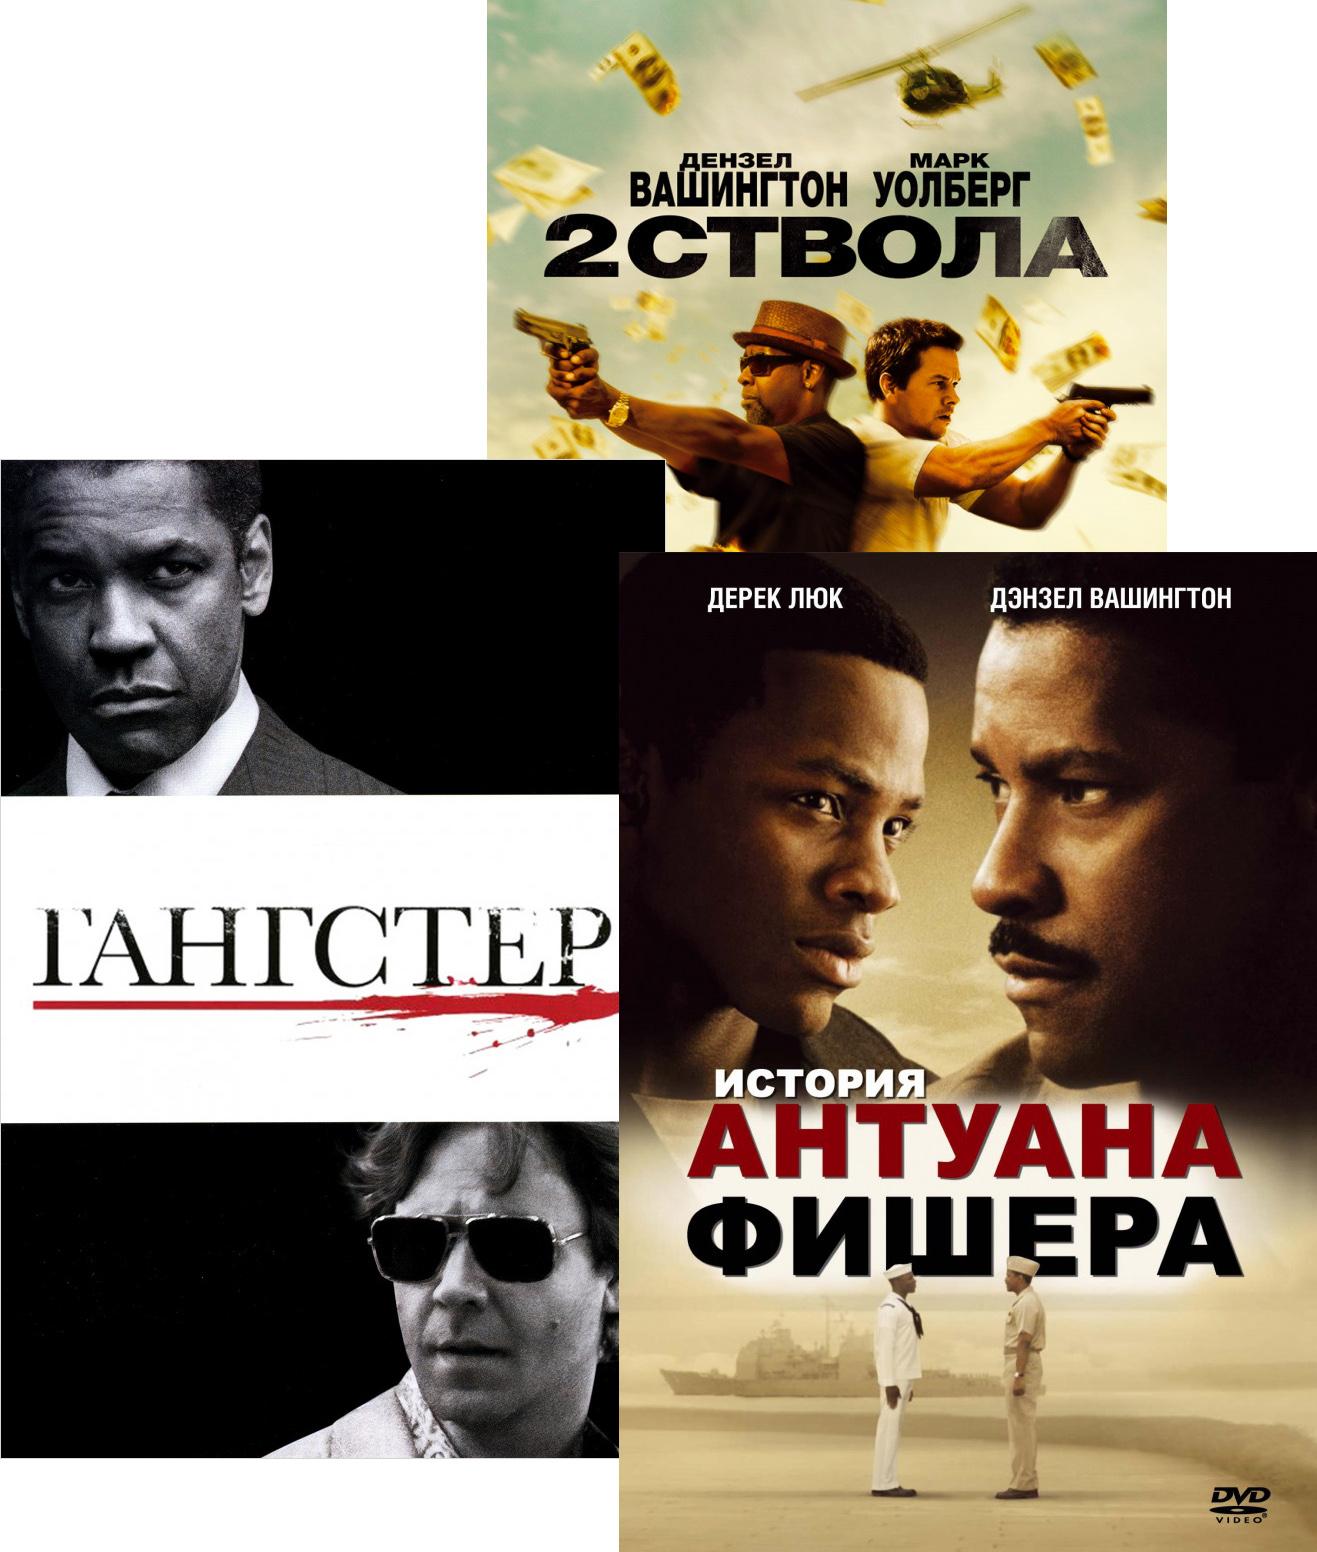 Гангстер / История Антуана Фишера / Два ствола (3 DVD) фото